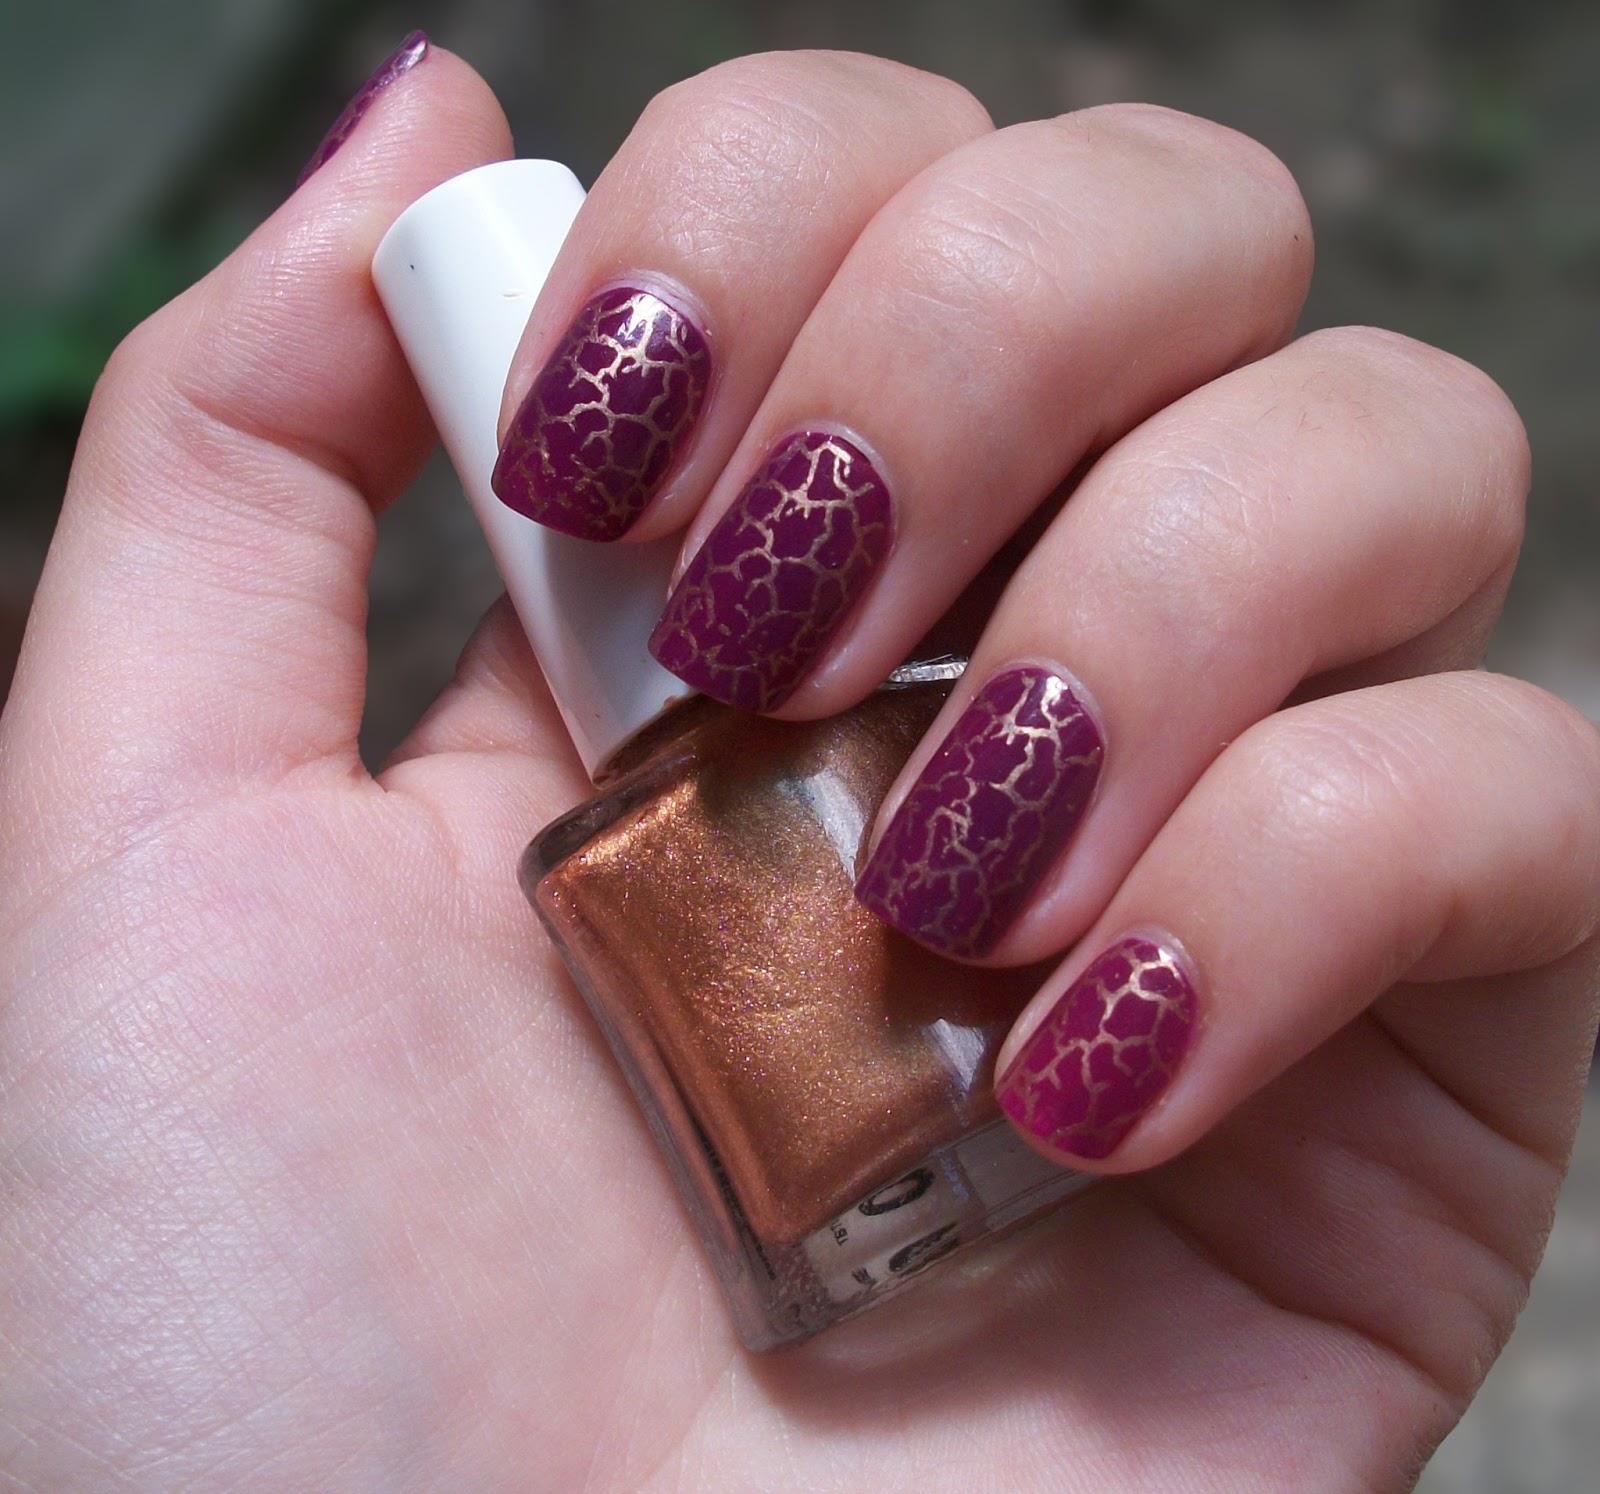 Кракелюр на ногтях фольгой: фото, особенности техники 19